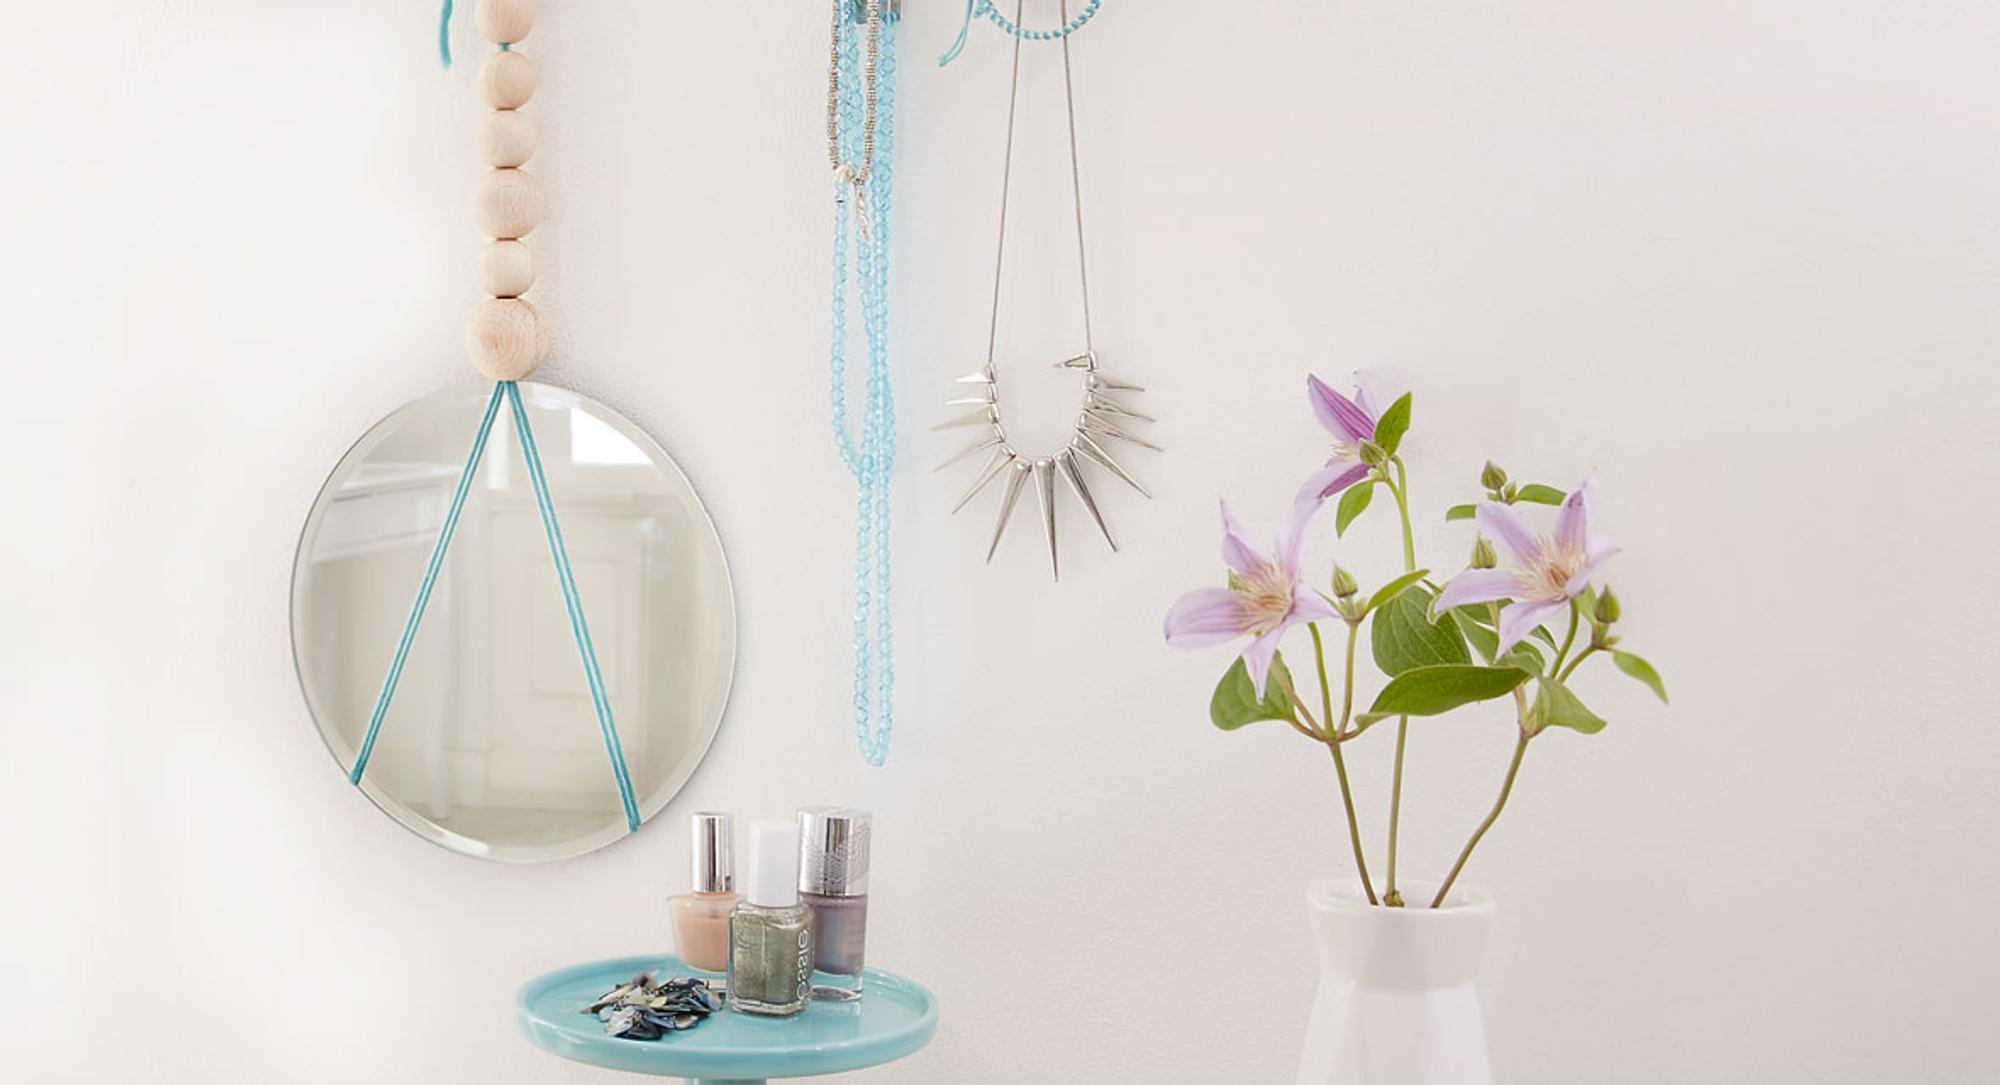 DIY Spiegel mit Holzkugeln hängt an der Wand